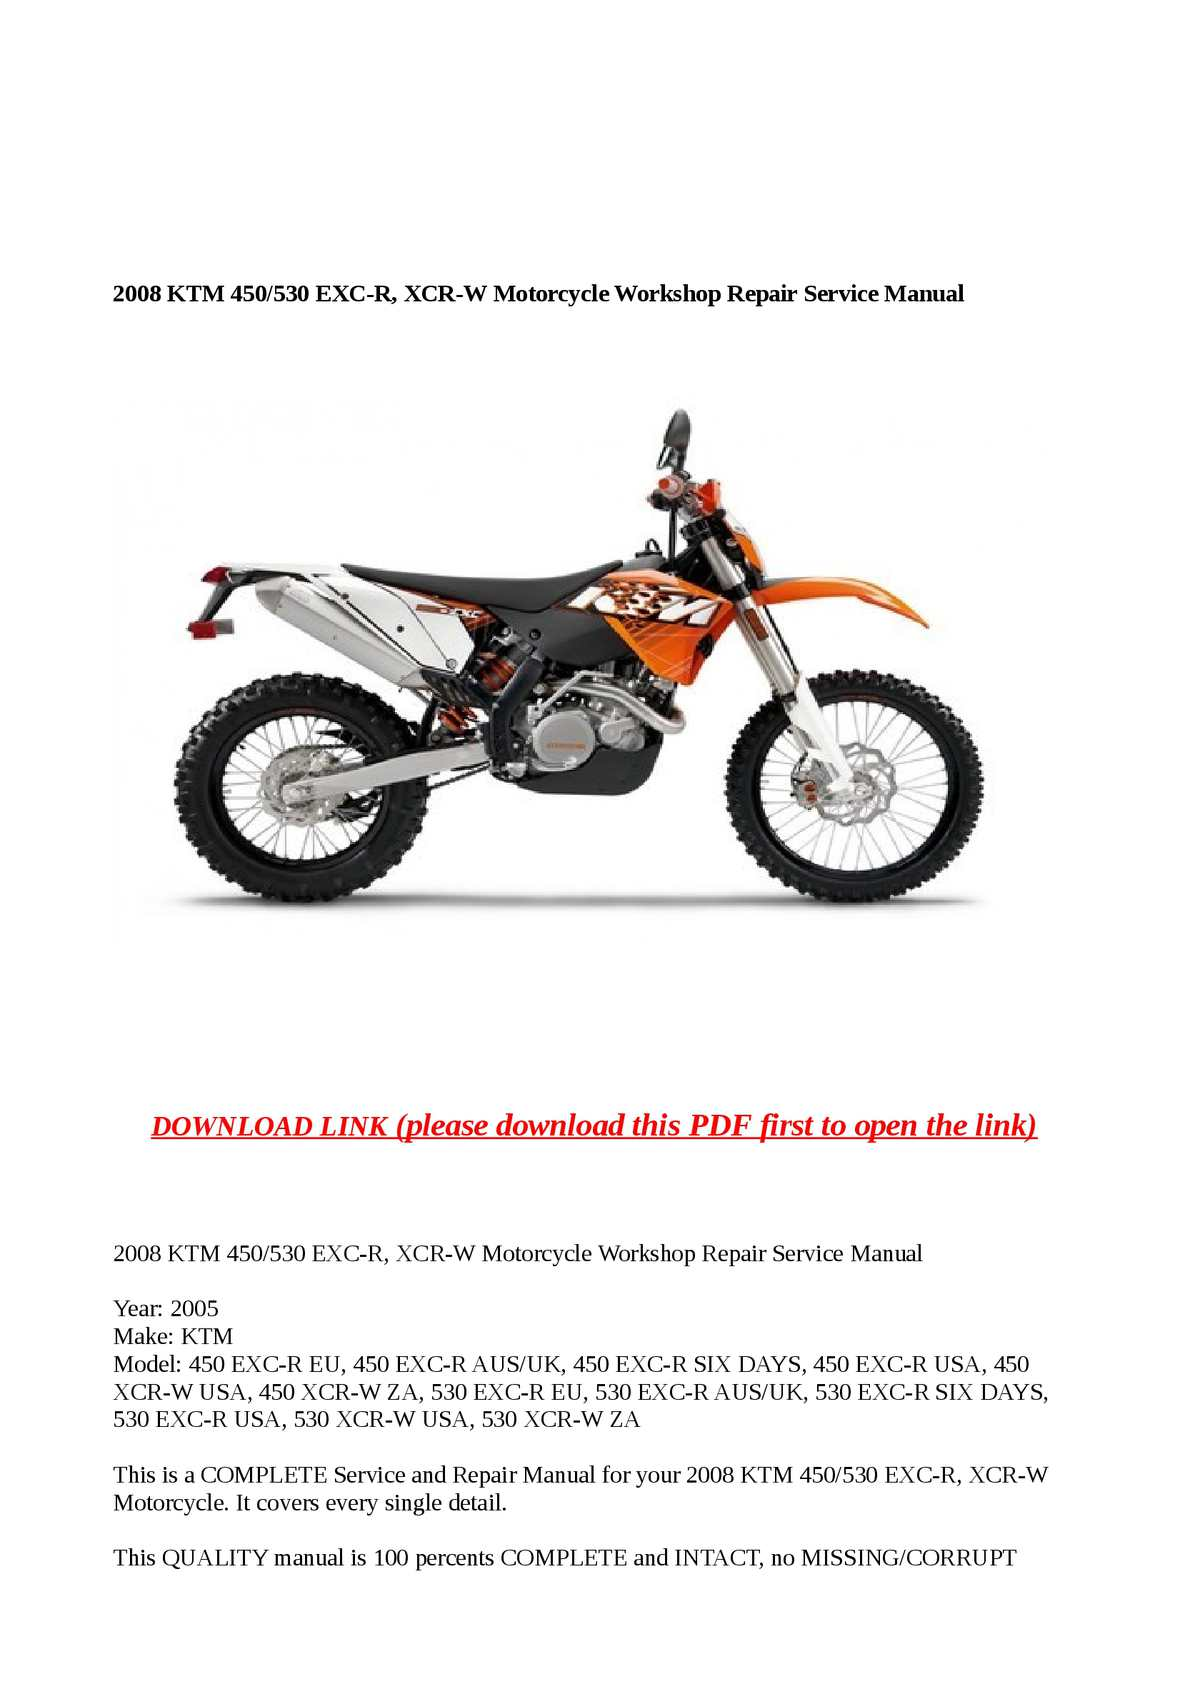 Calaméo - 2008 KTM 450/530 EXC-R, XCR-W Motorcycle Workshop Repair Service  Manual